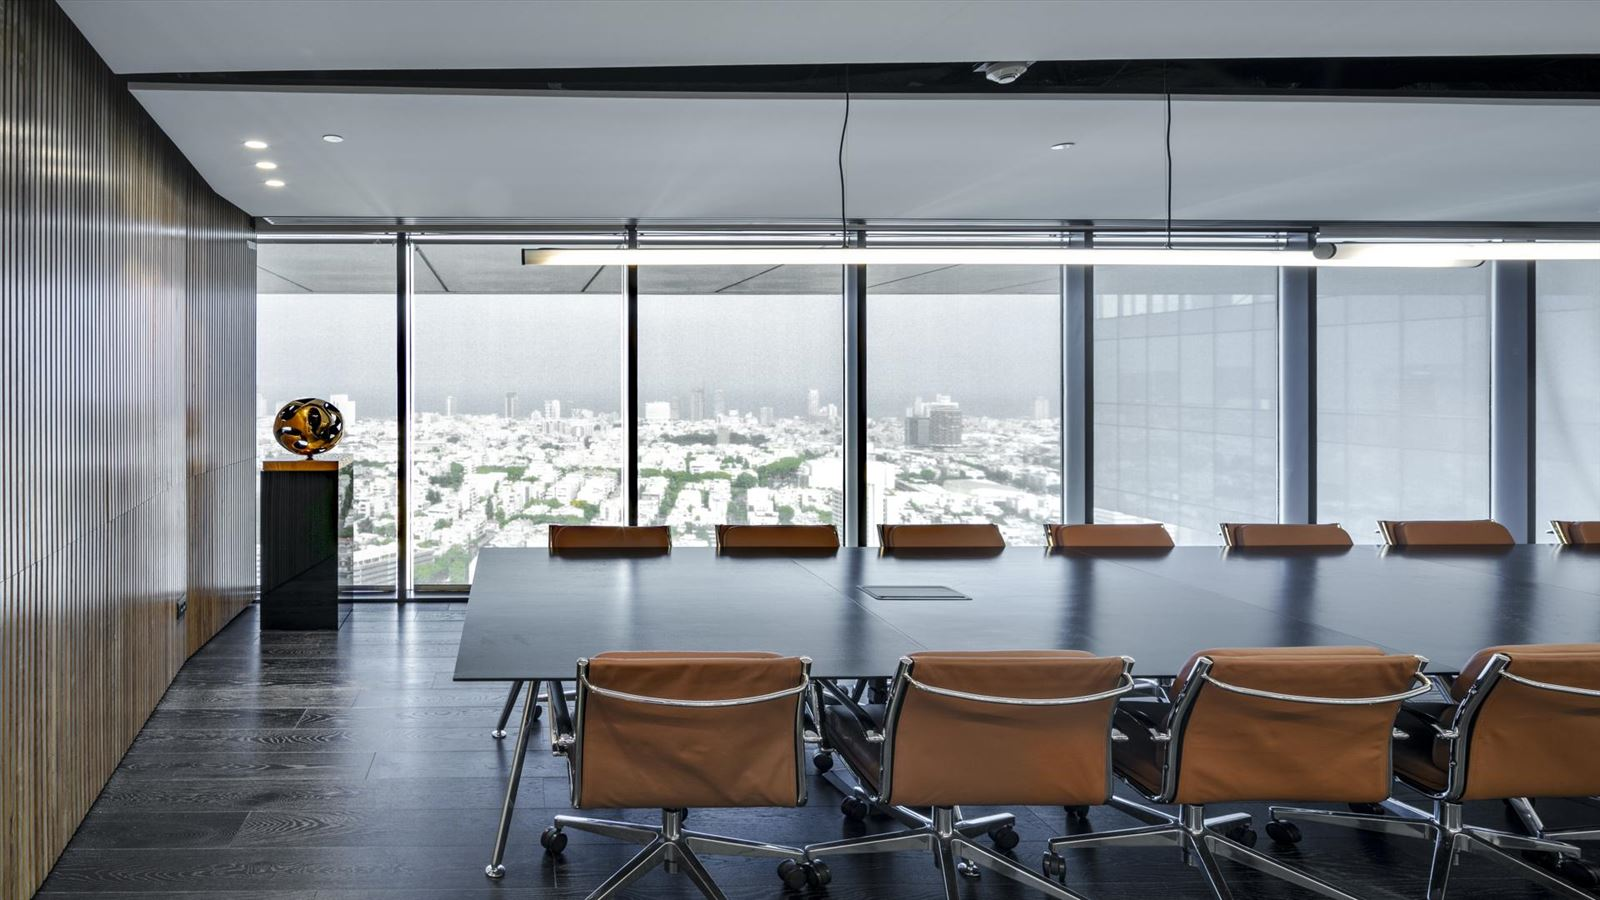 Fortissimo Offices – Tel Aviv גופי תאורה מאירים את חדר הישיבות בתכנון דורי קמחי